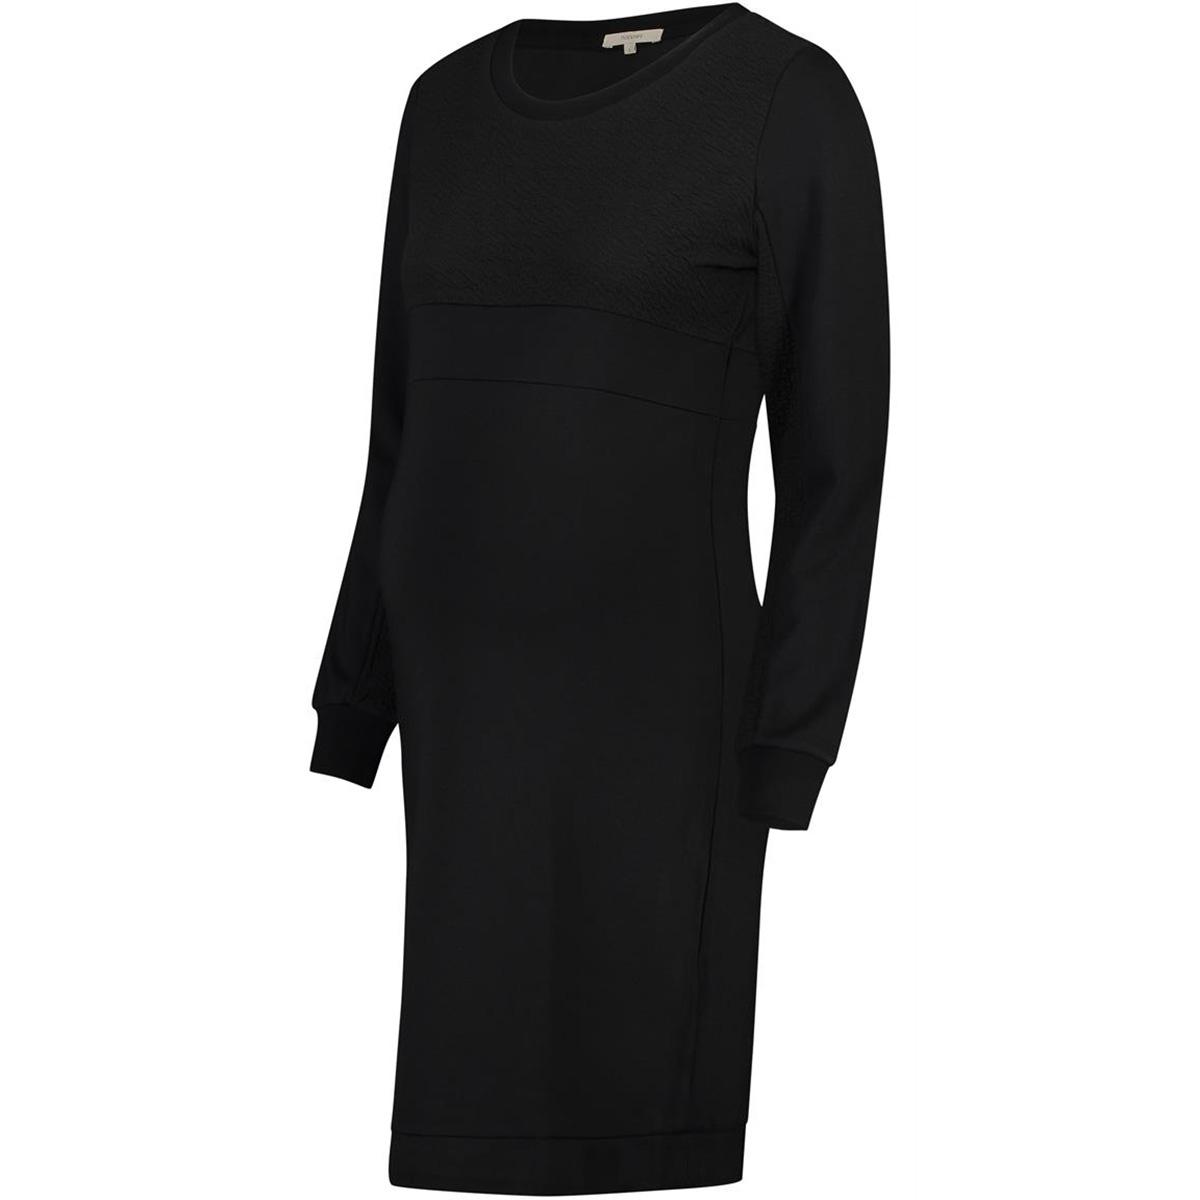 80733 dress is morning noppies positie jurk c270 black